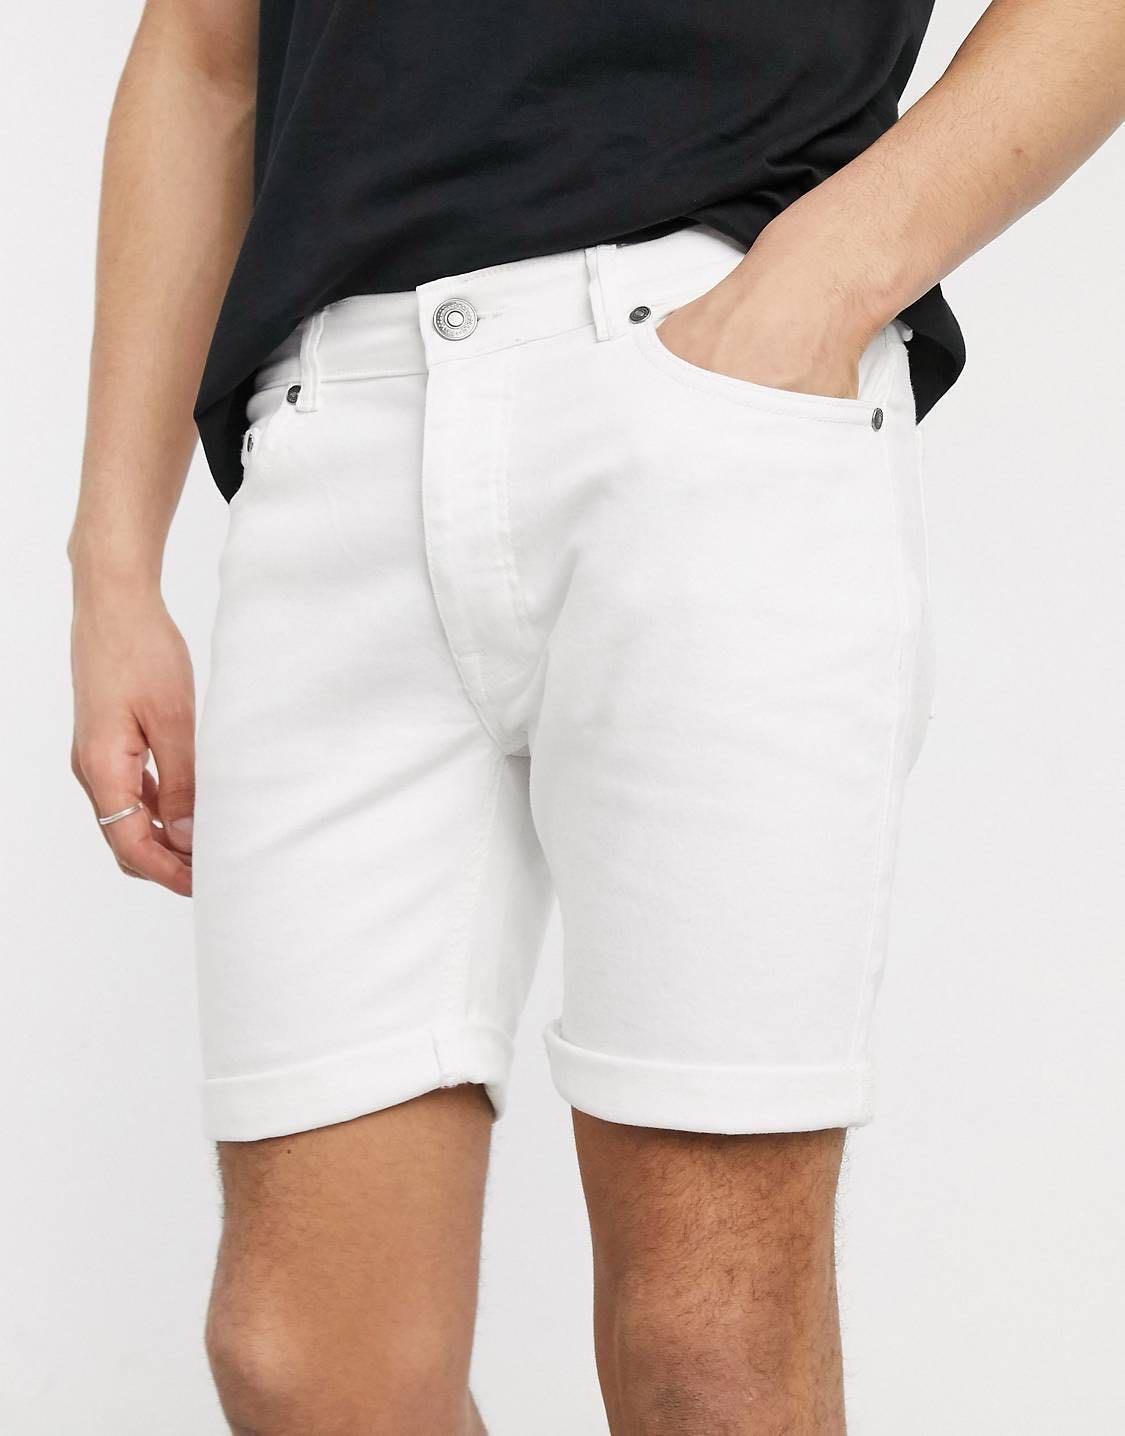 boohooMAN skinny fit shorts 白短褲 牛仔褲 緊身 全新30腰